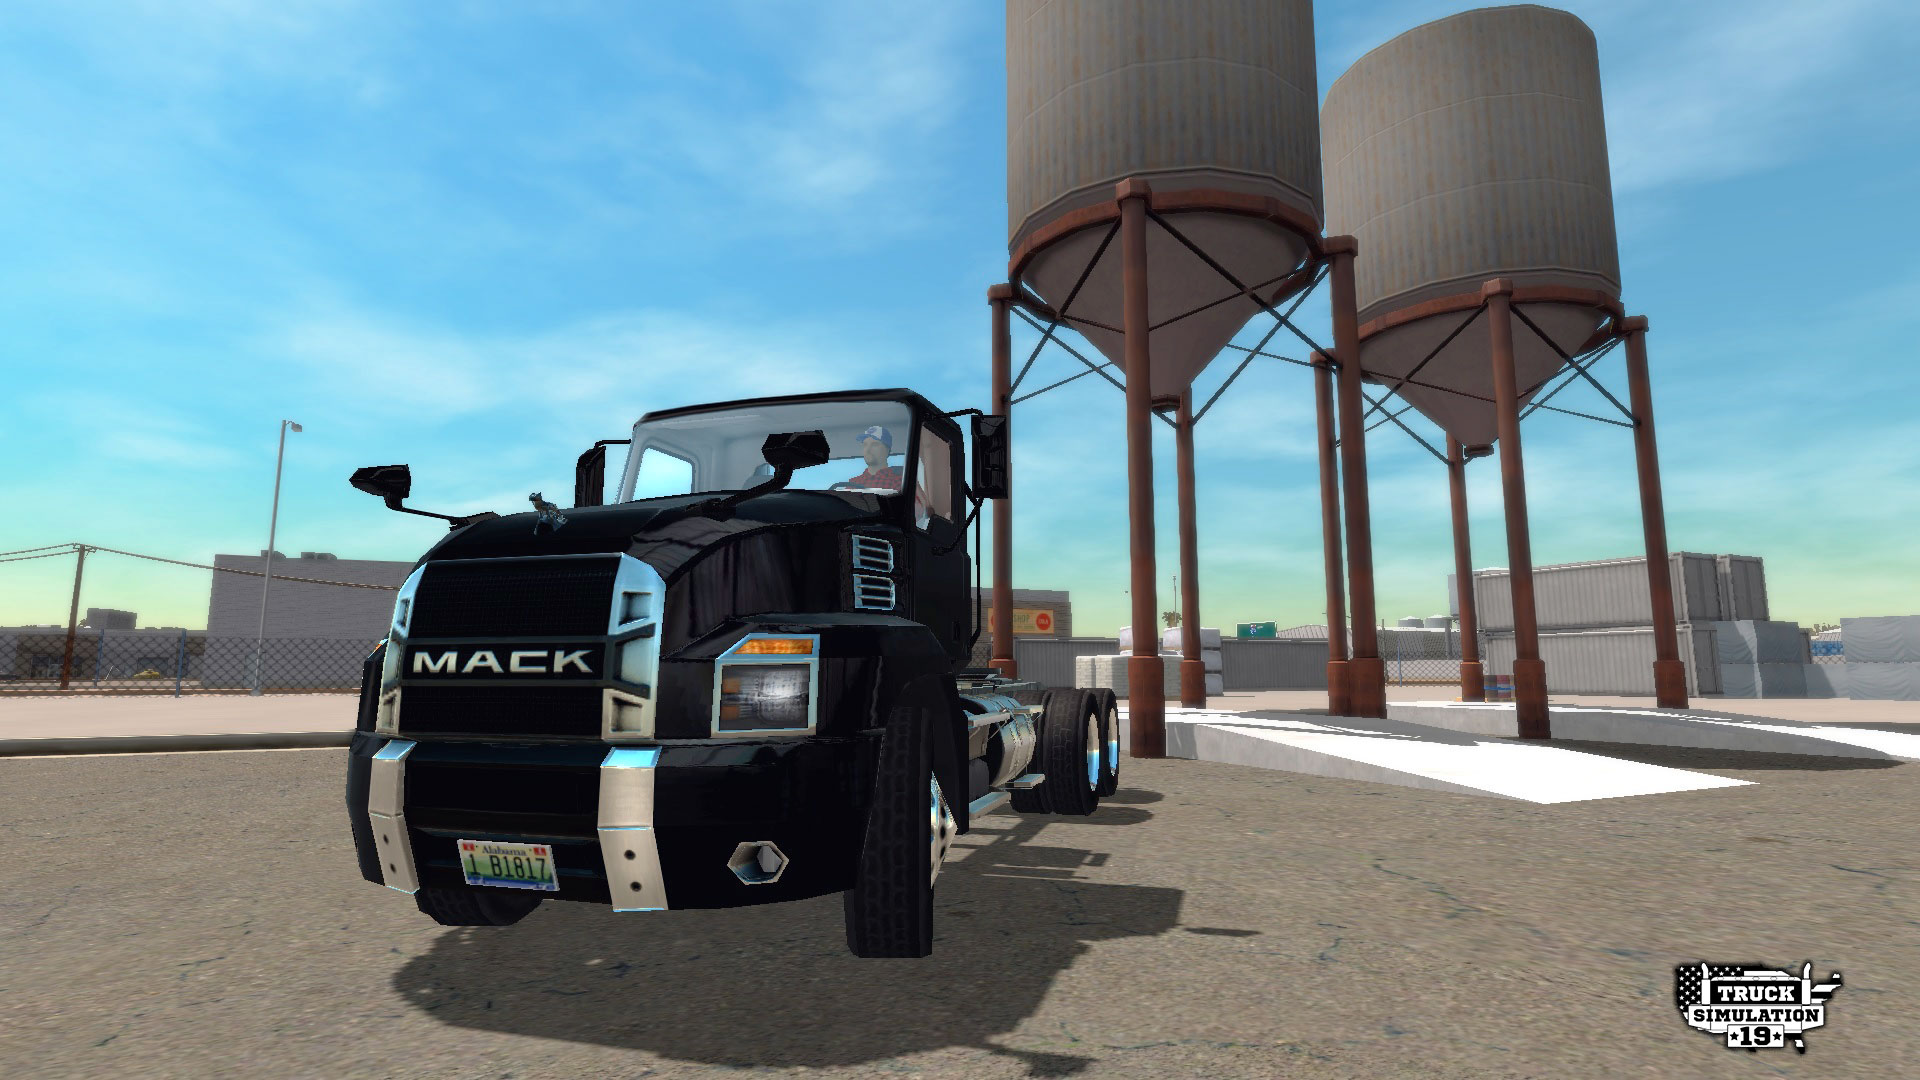 Truck Simulation 19 | DRIVE THE ORIGINAL